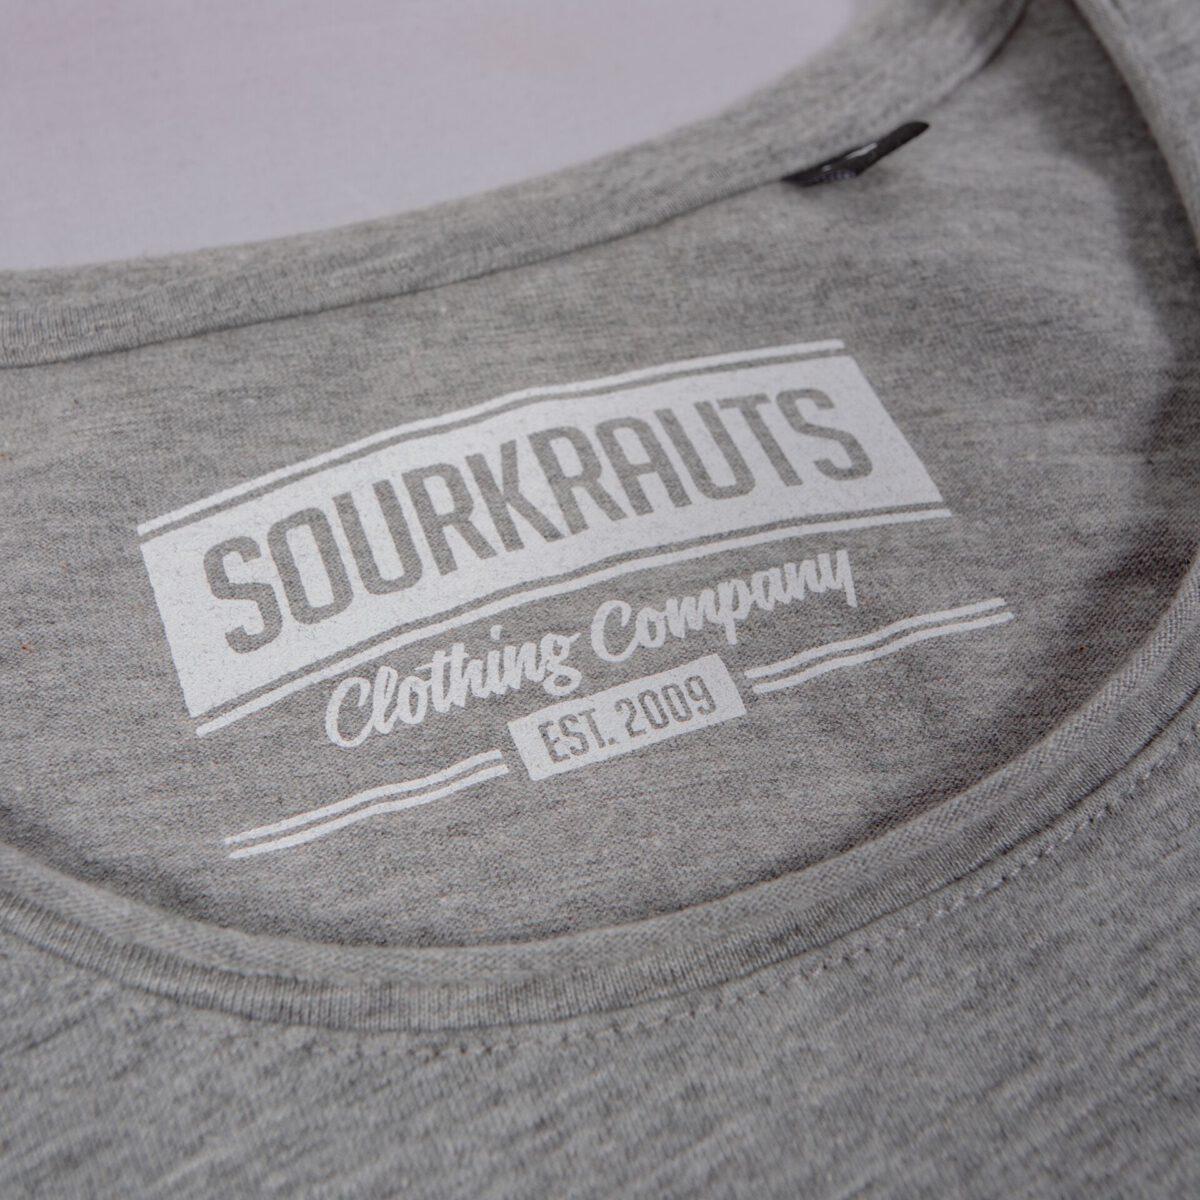 Sourkrauts T-Shirt Paolo